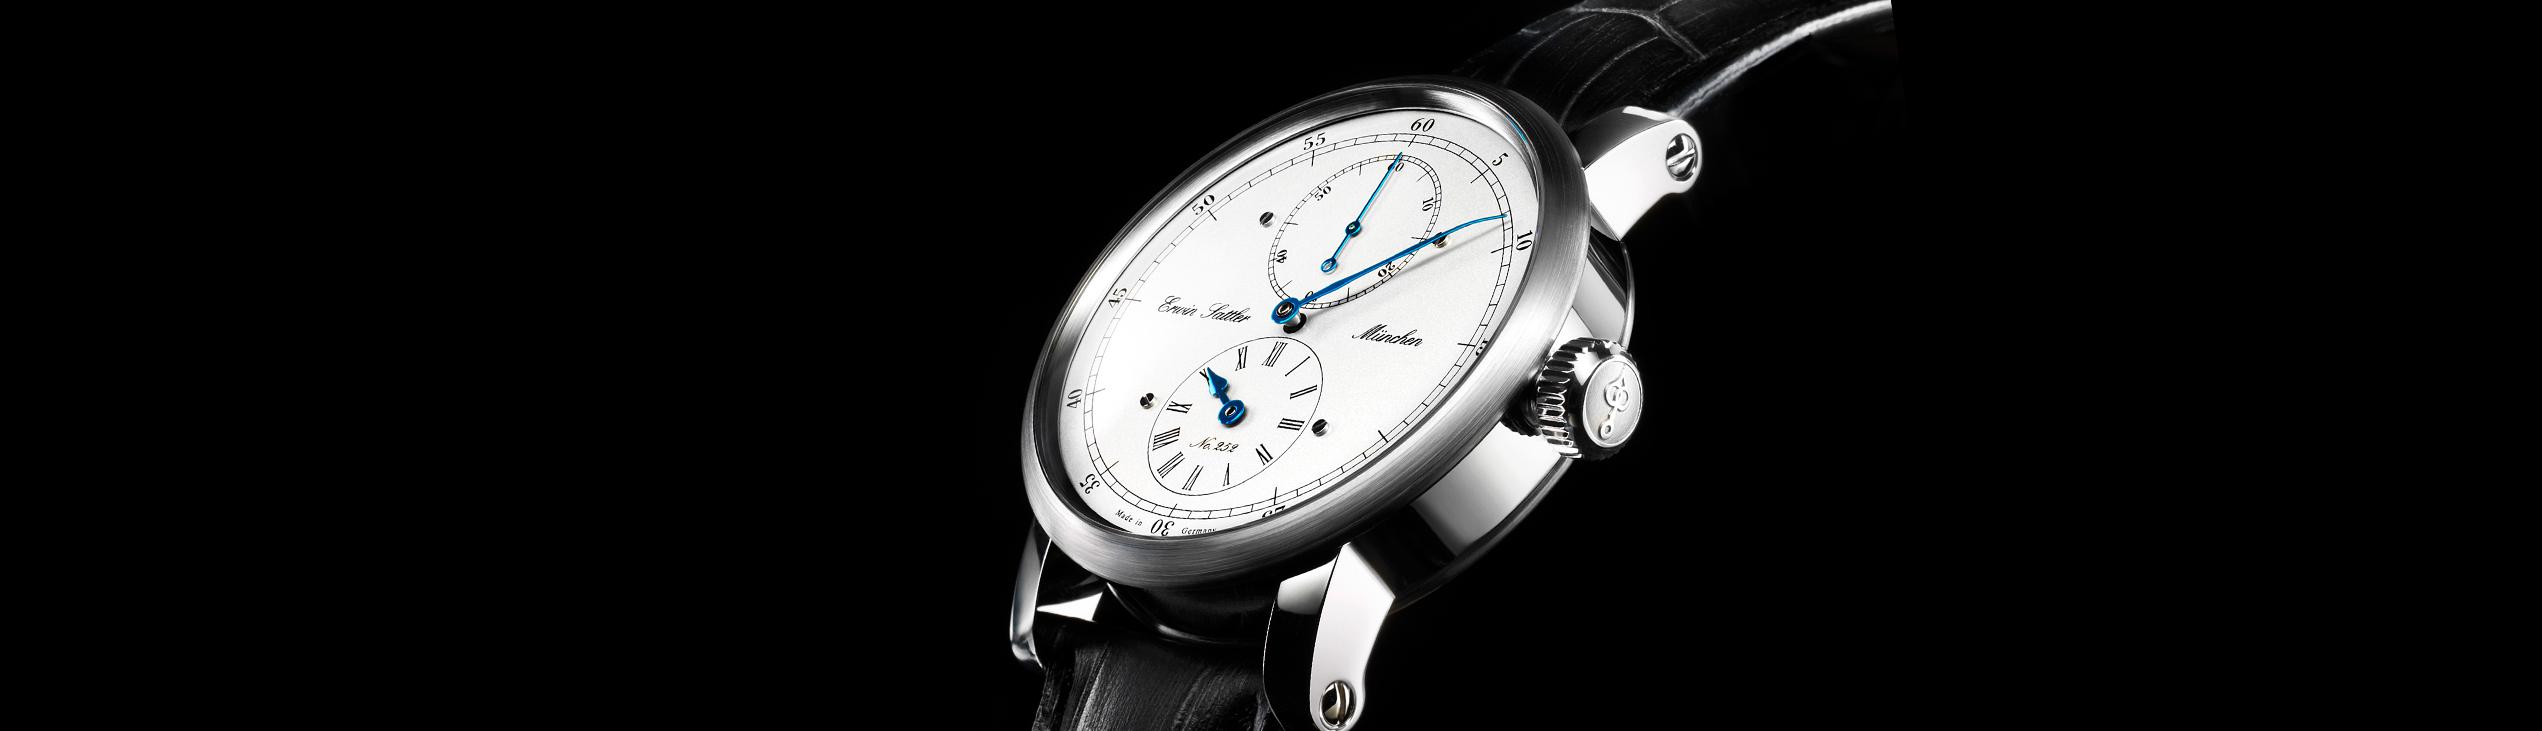 Erwin Sattler Armbanduhr-Classica-Secunda